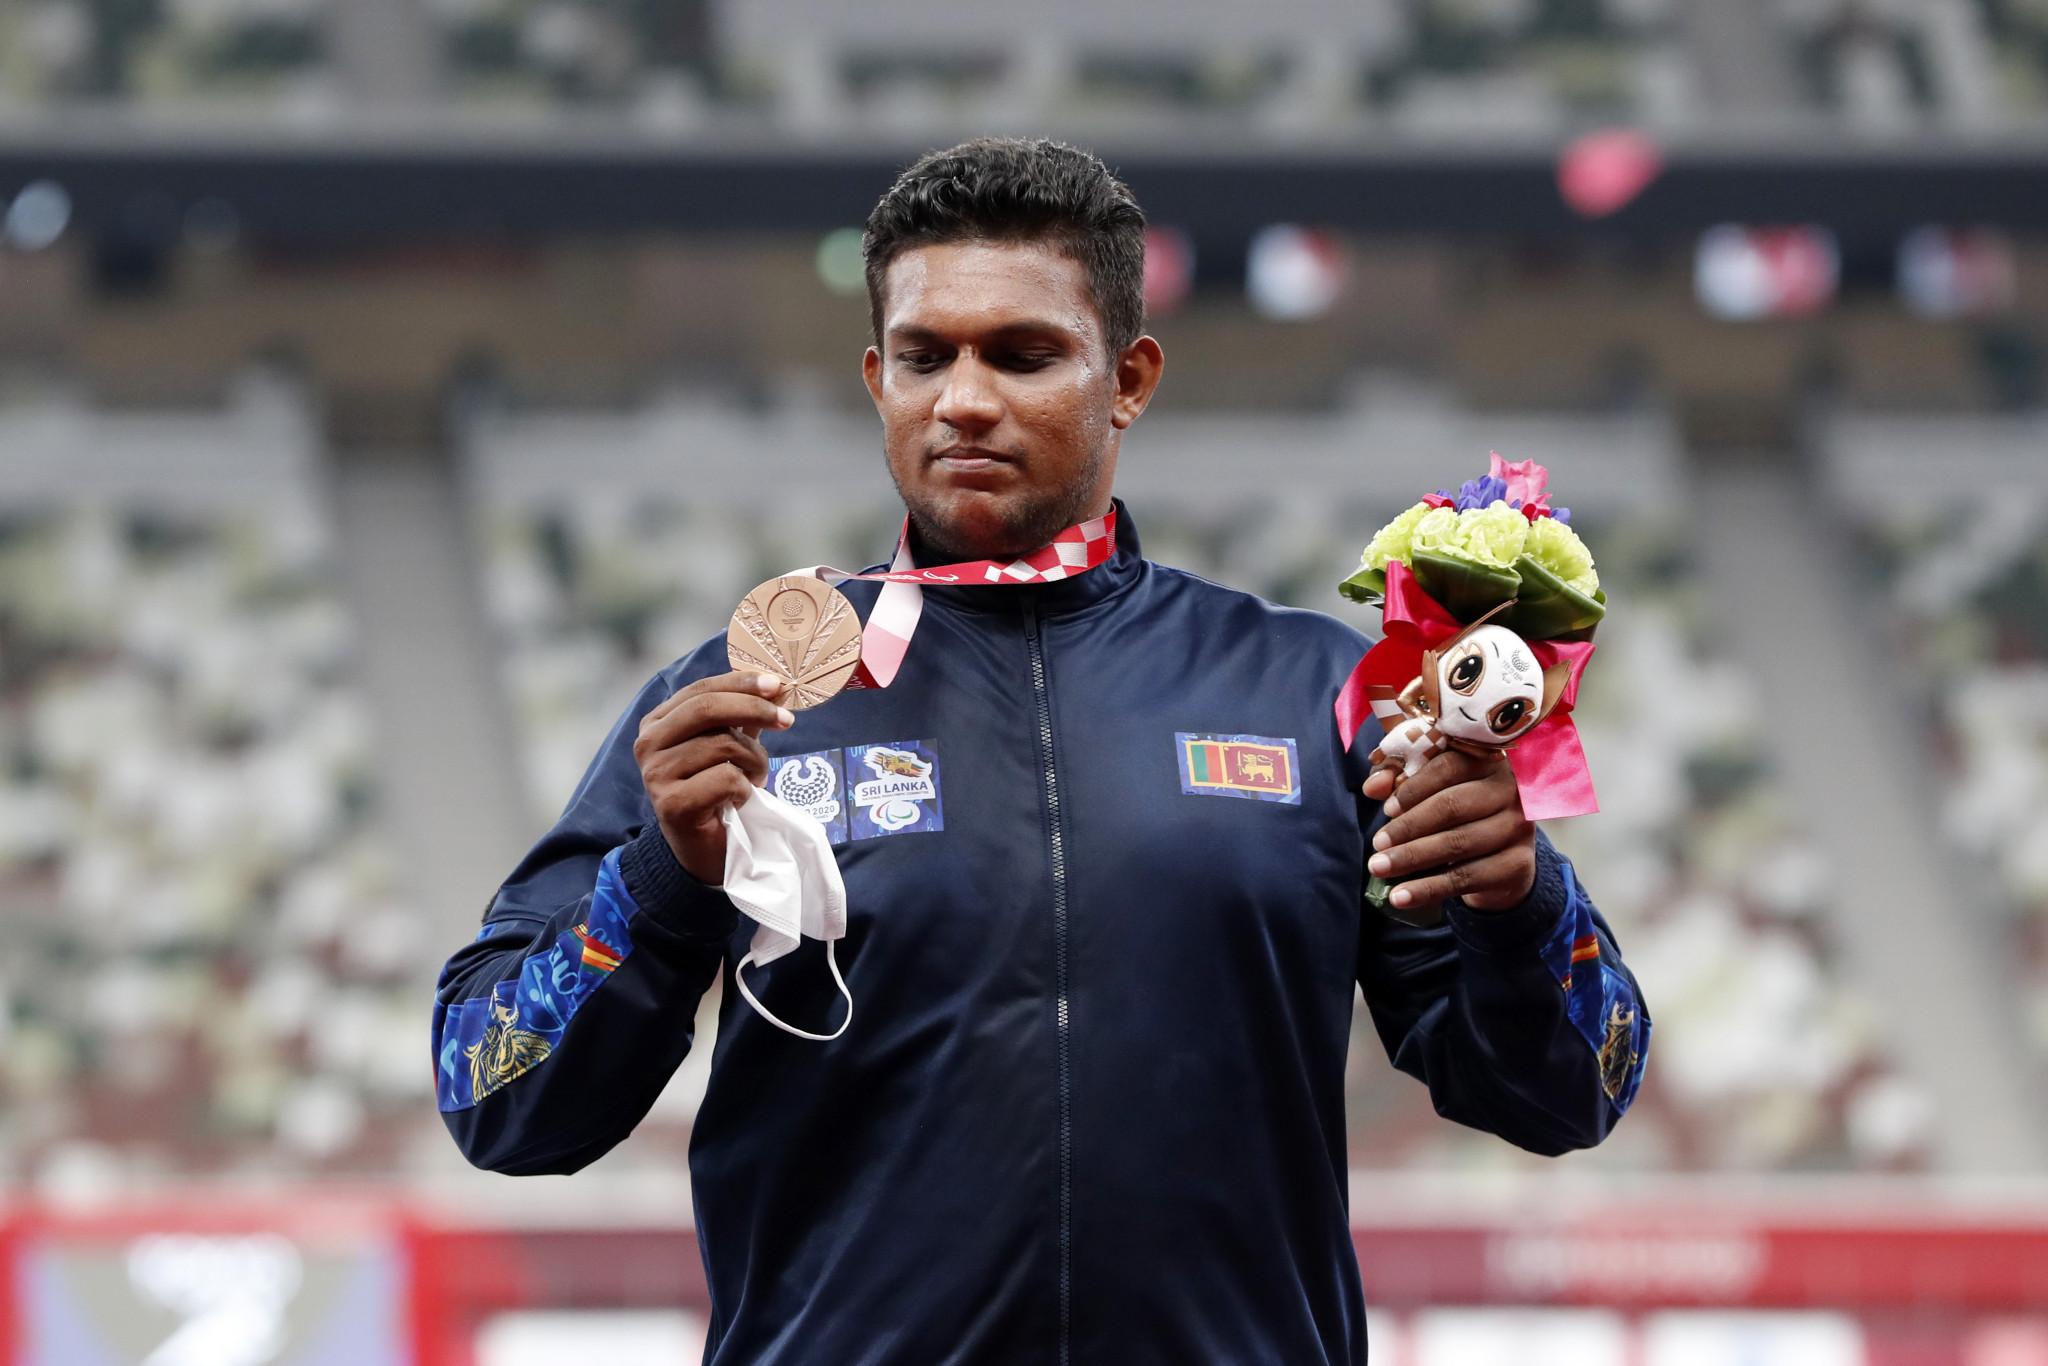 Dulan Kodithuwakku won Sri Lanka's third Paralympic bronze medal ©Getty Images